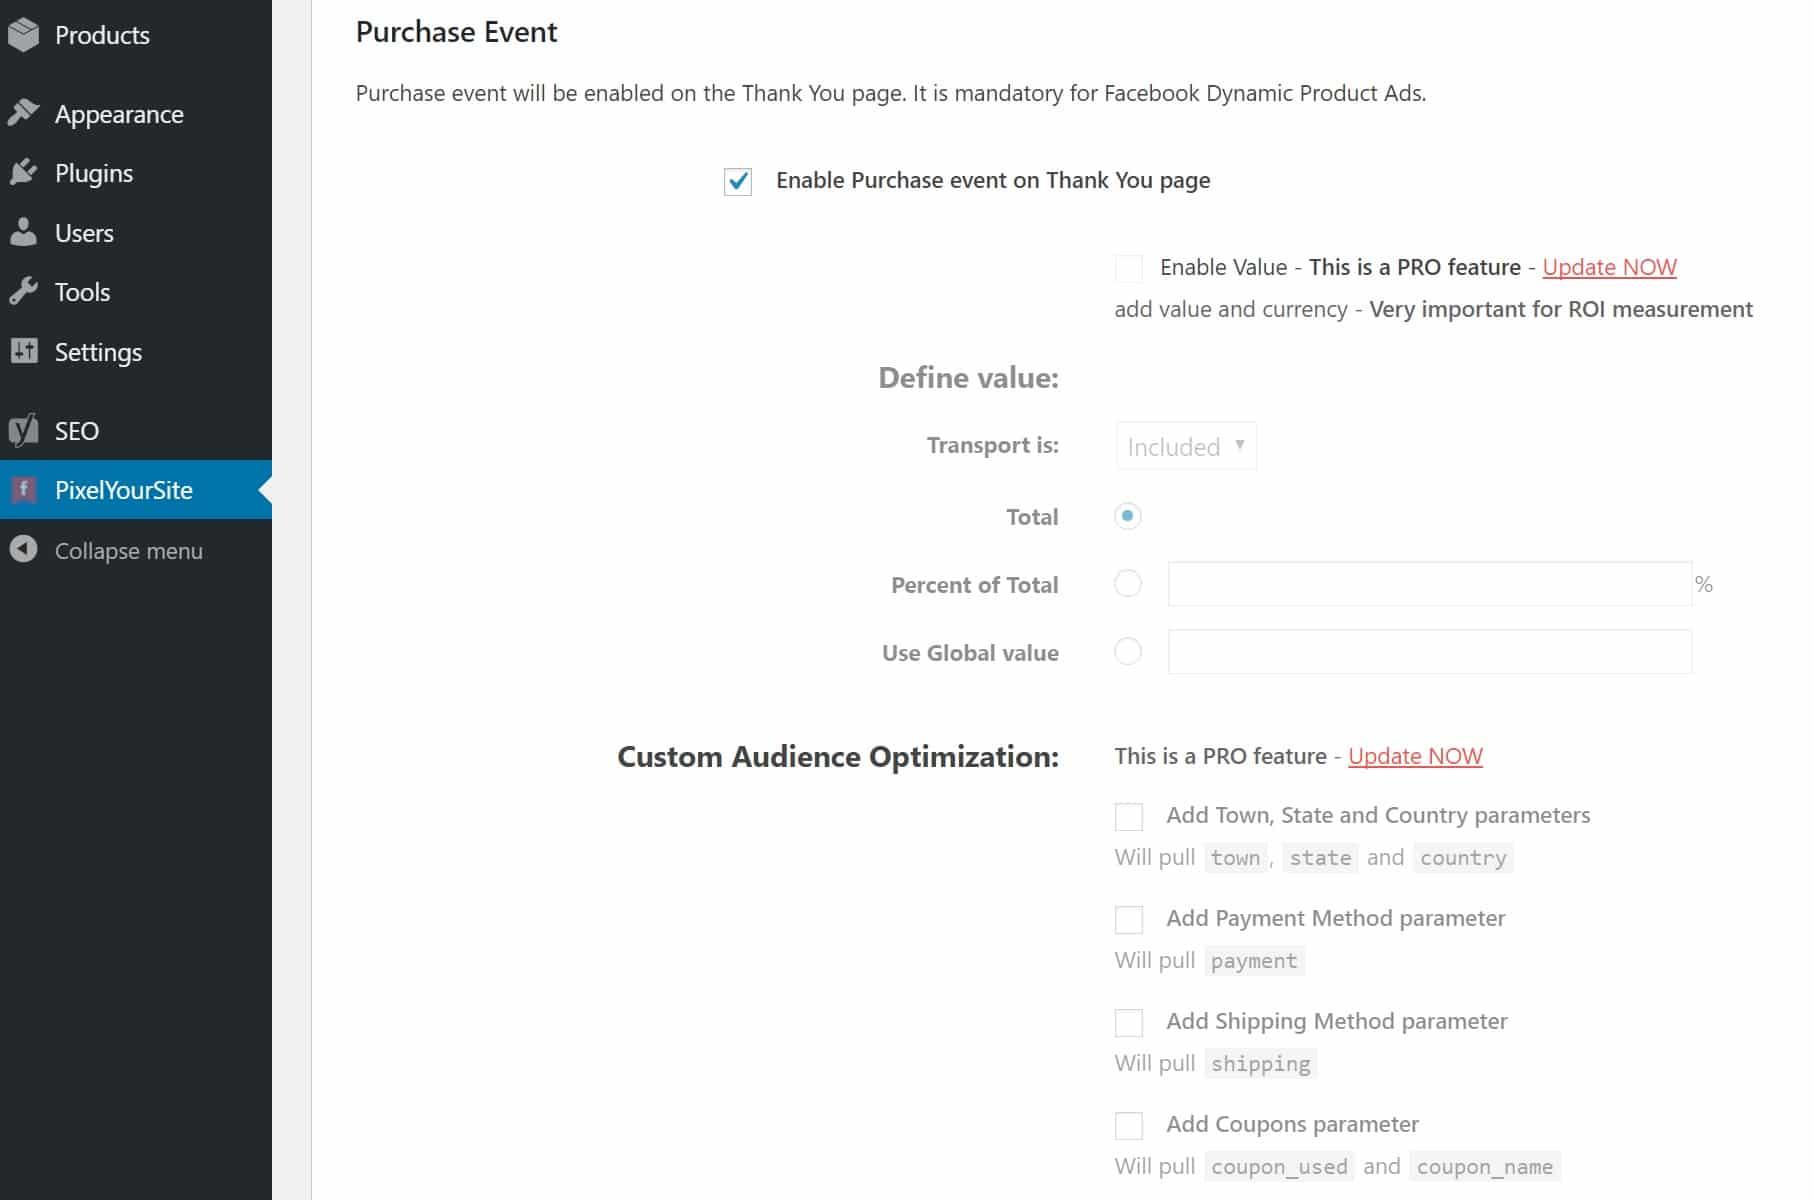 Evento de compra WooCommerce na página de agradecimento